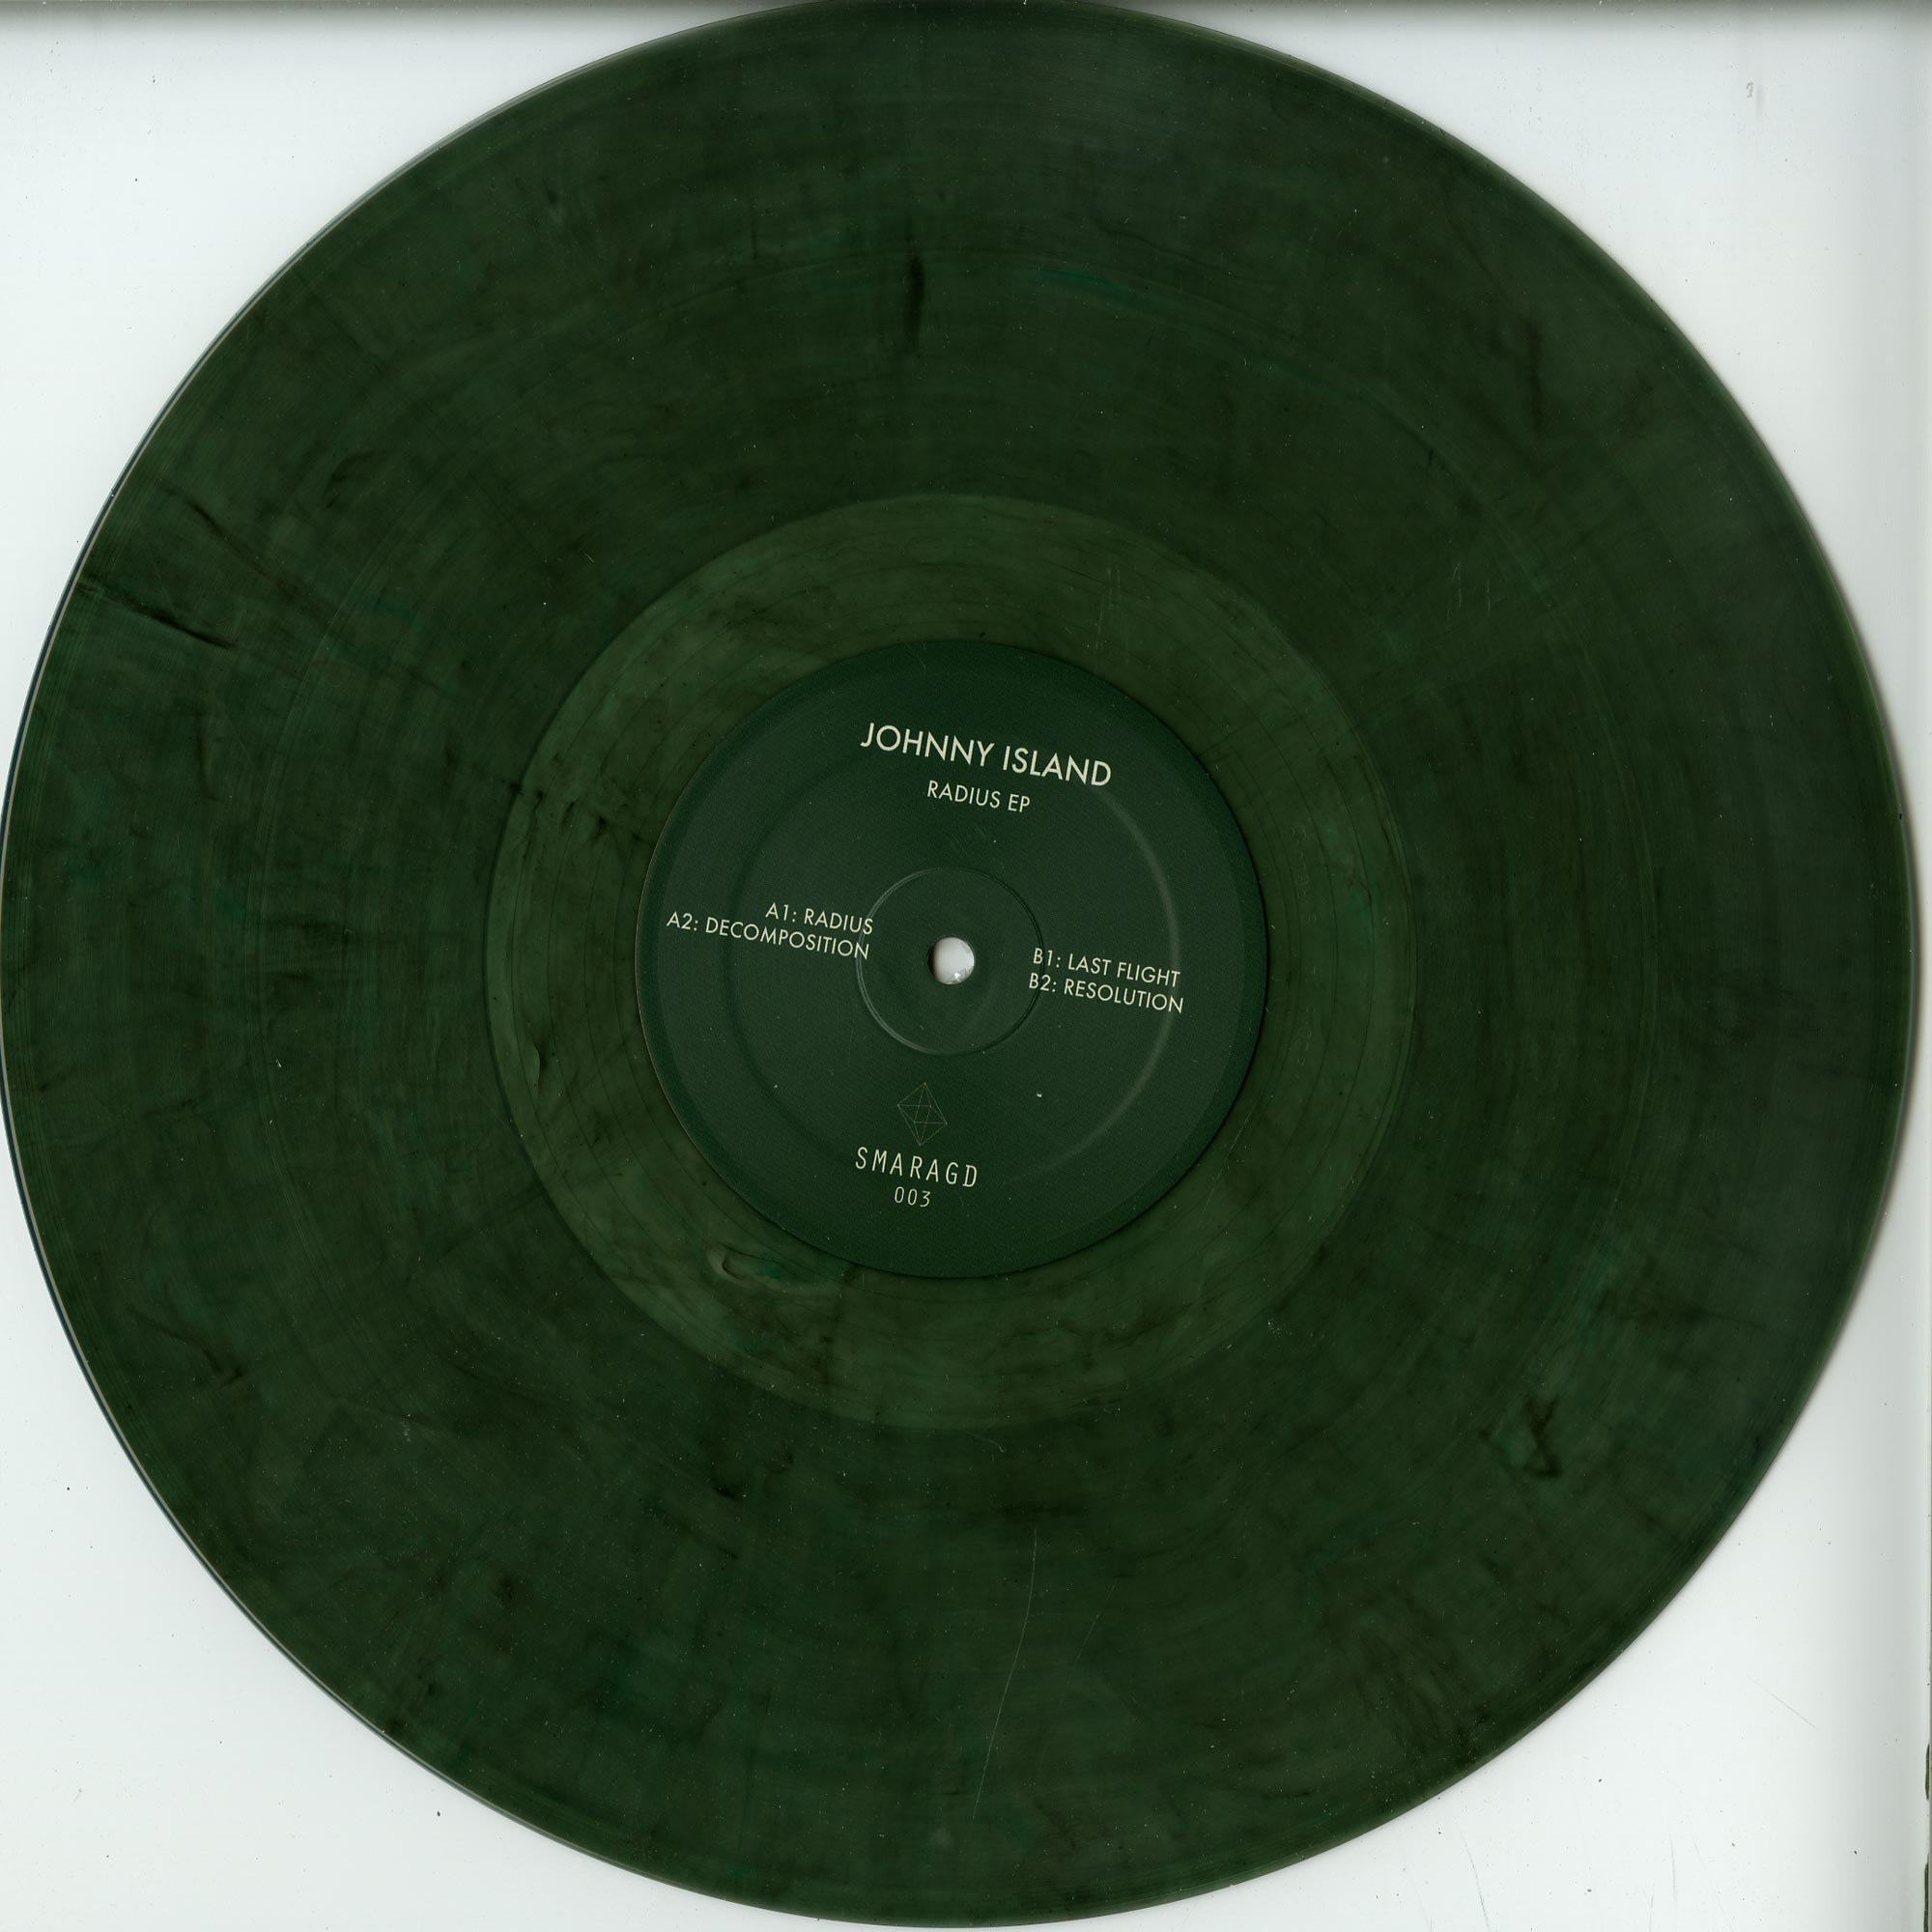 Johnny Island - RADIUS EP